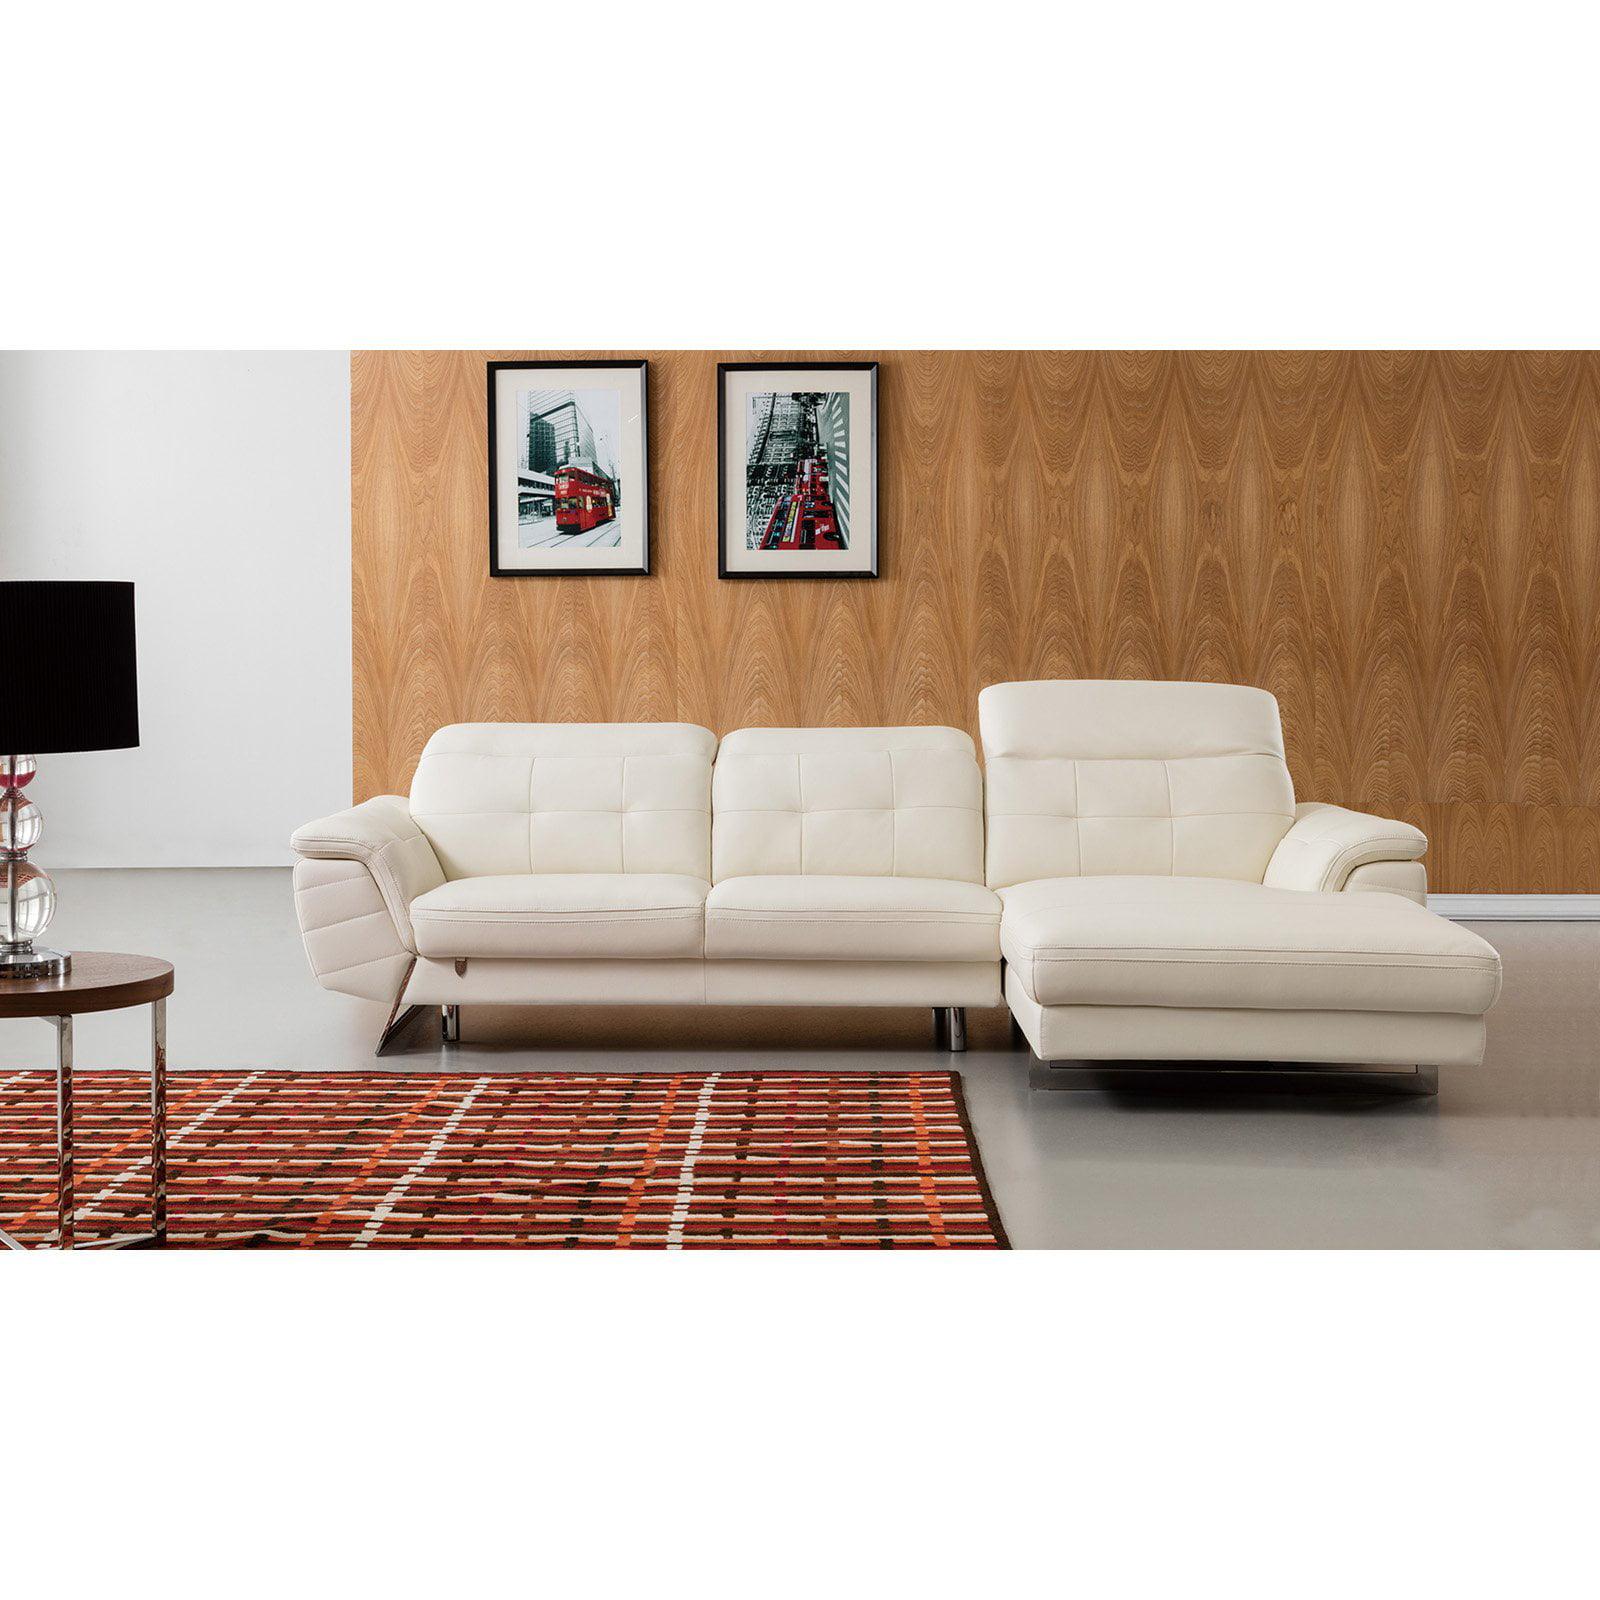 American Eagle Furniture Adair Italian Leather Sectional Sofa